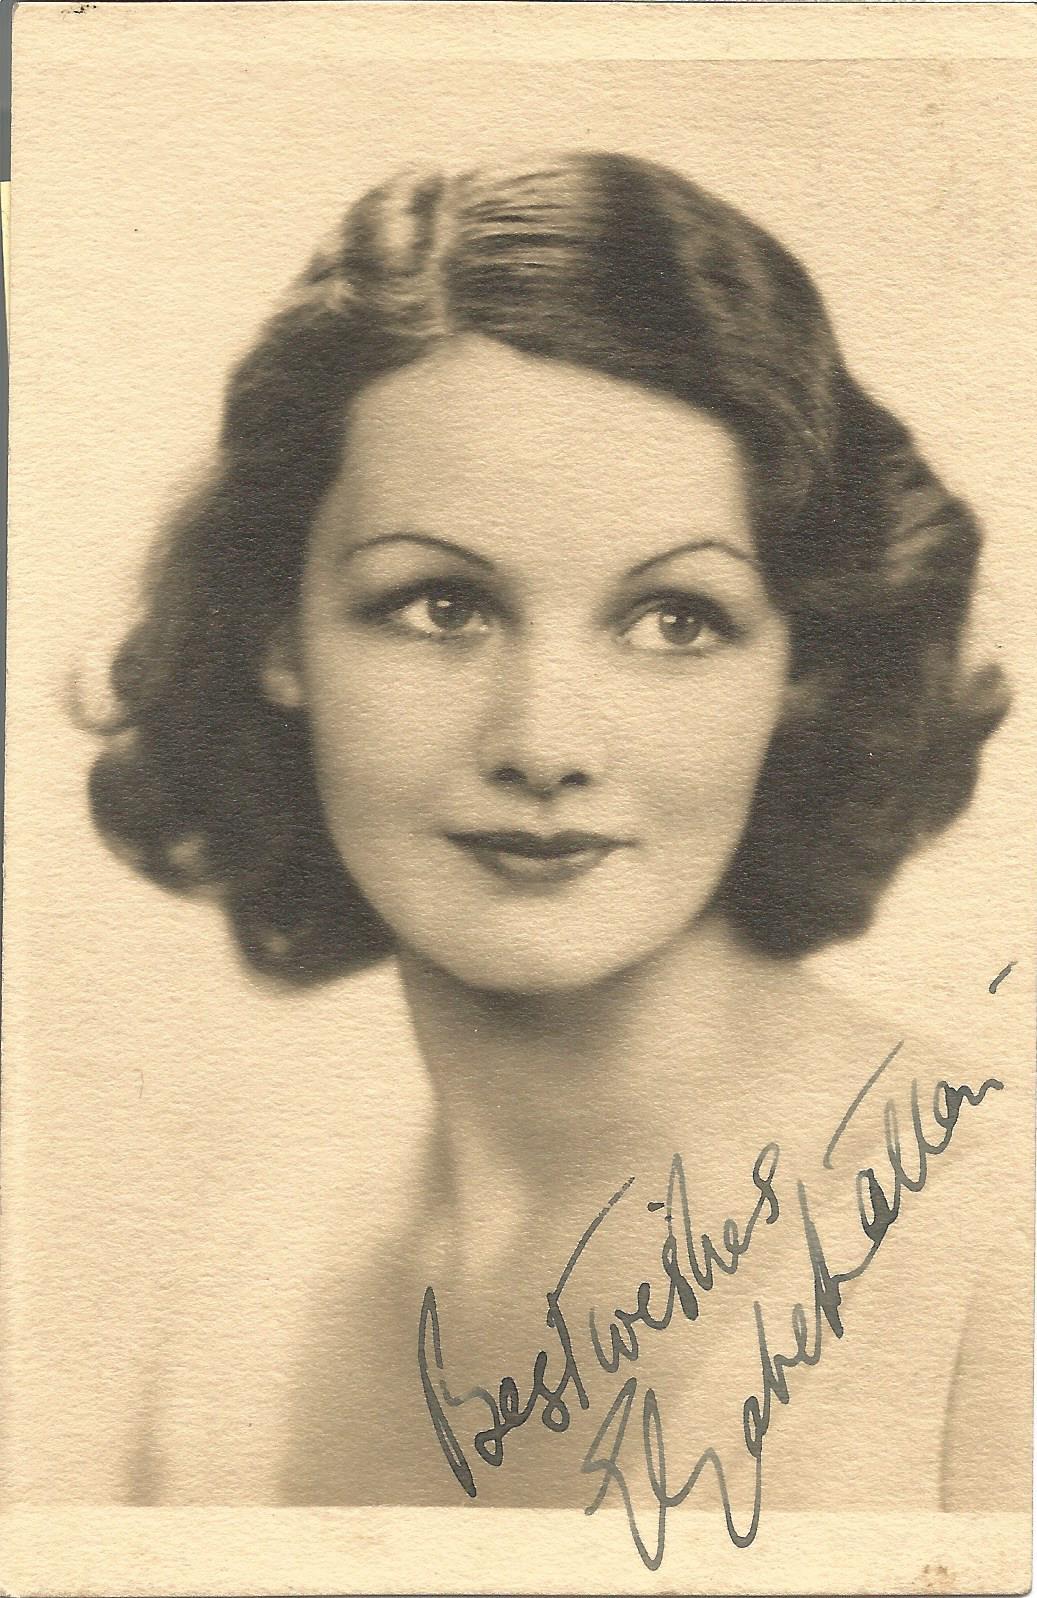 Actress Elizabeth Allan vintage signed 5x3½ black and white image. Elizabeth Allan was an English